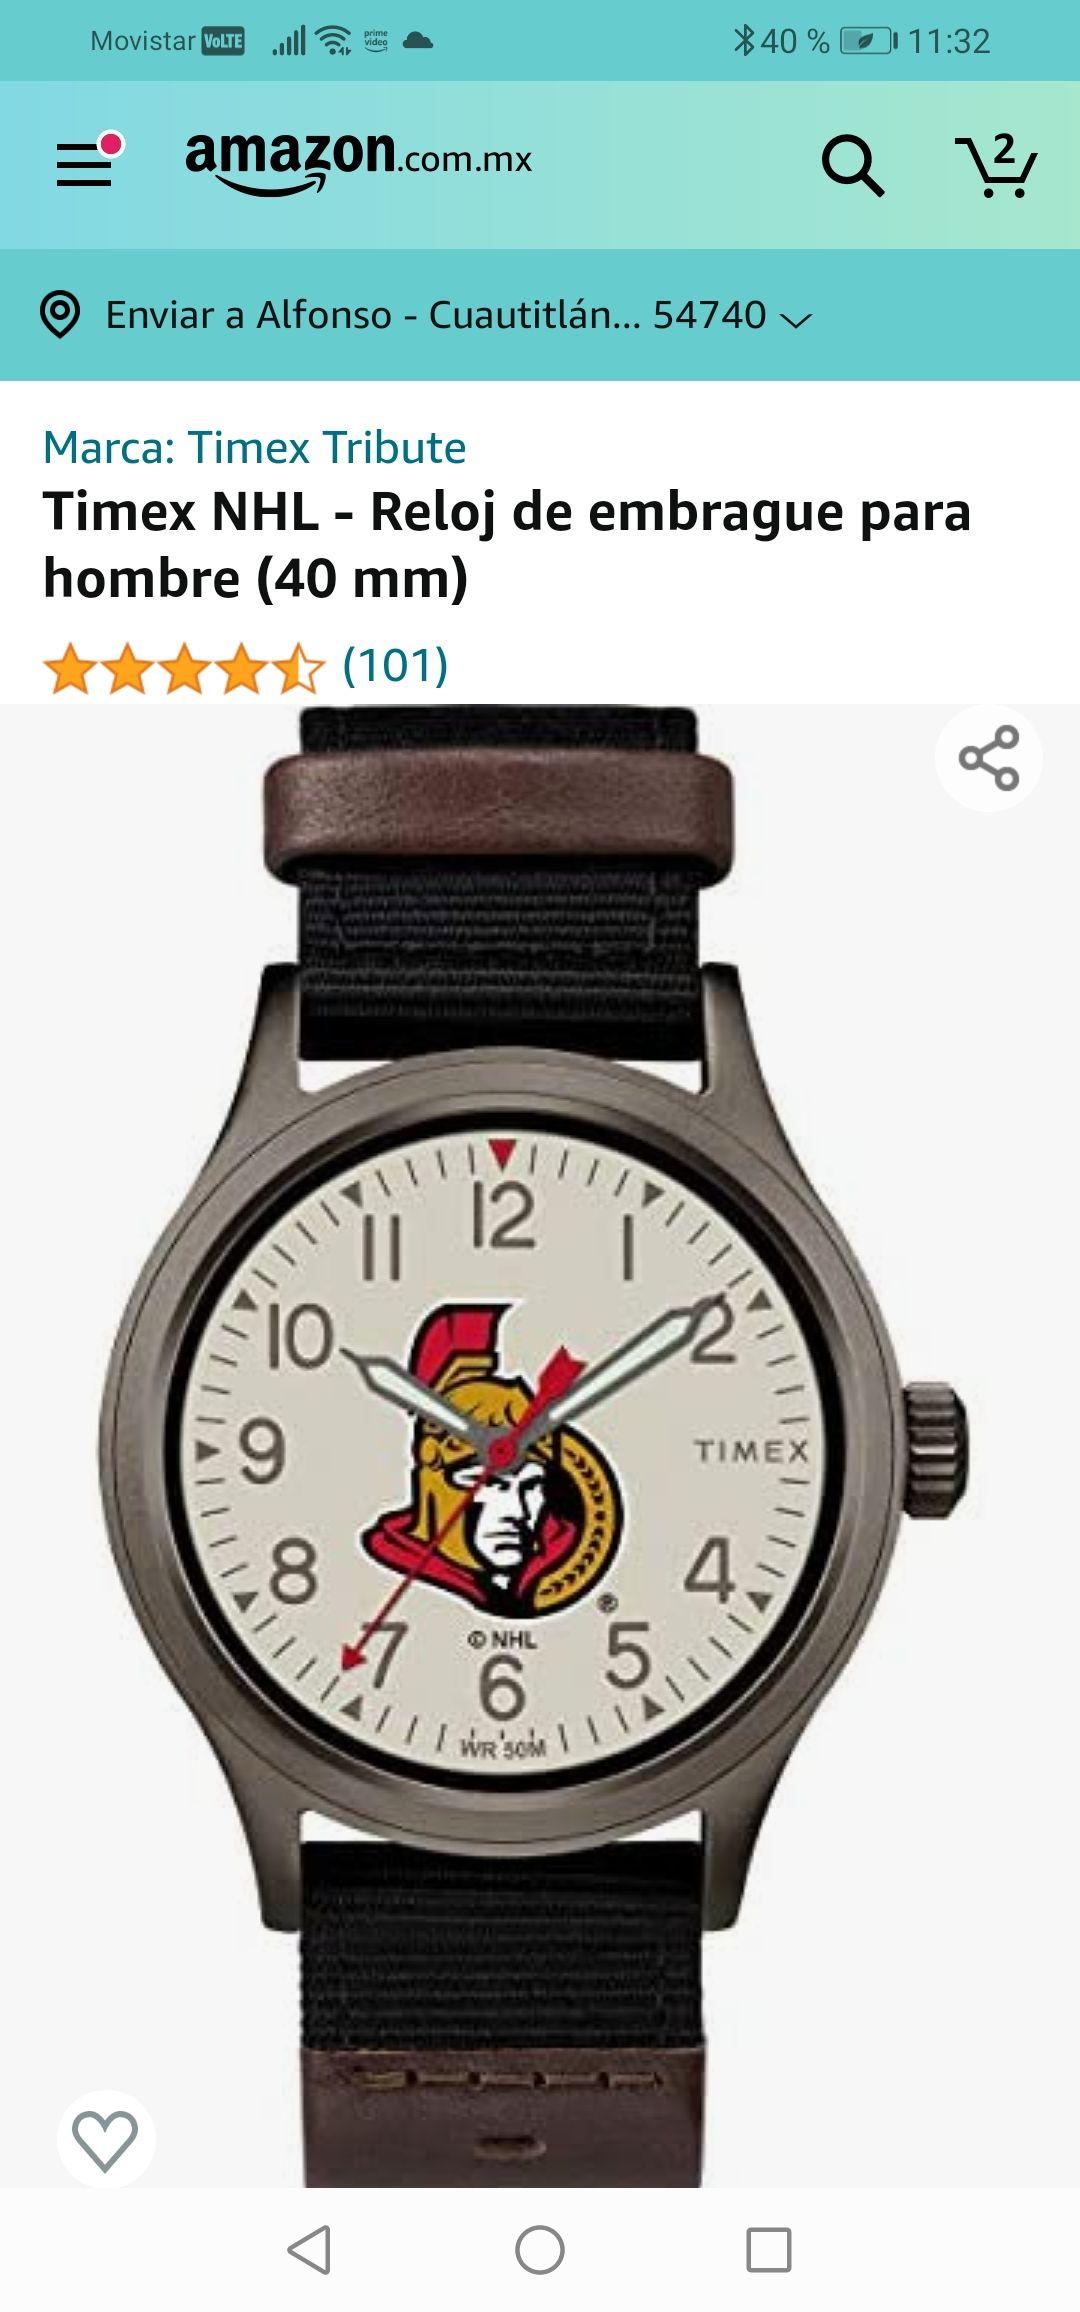 Amazon : Timex NHL - Reloj de embrague para hombre (40 mm)